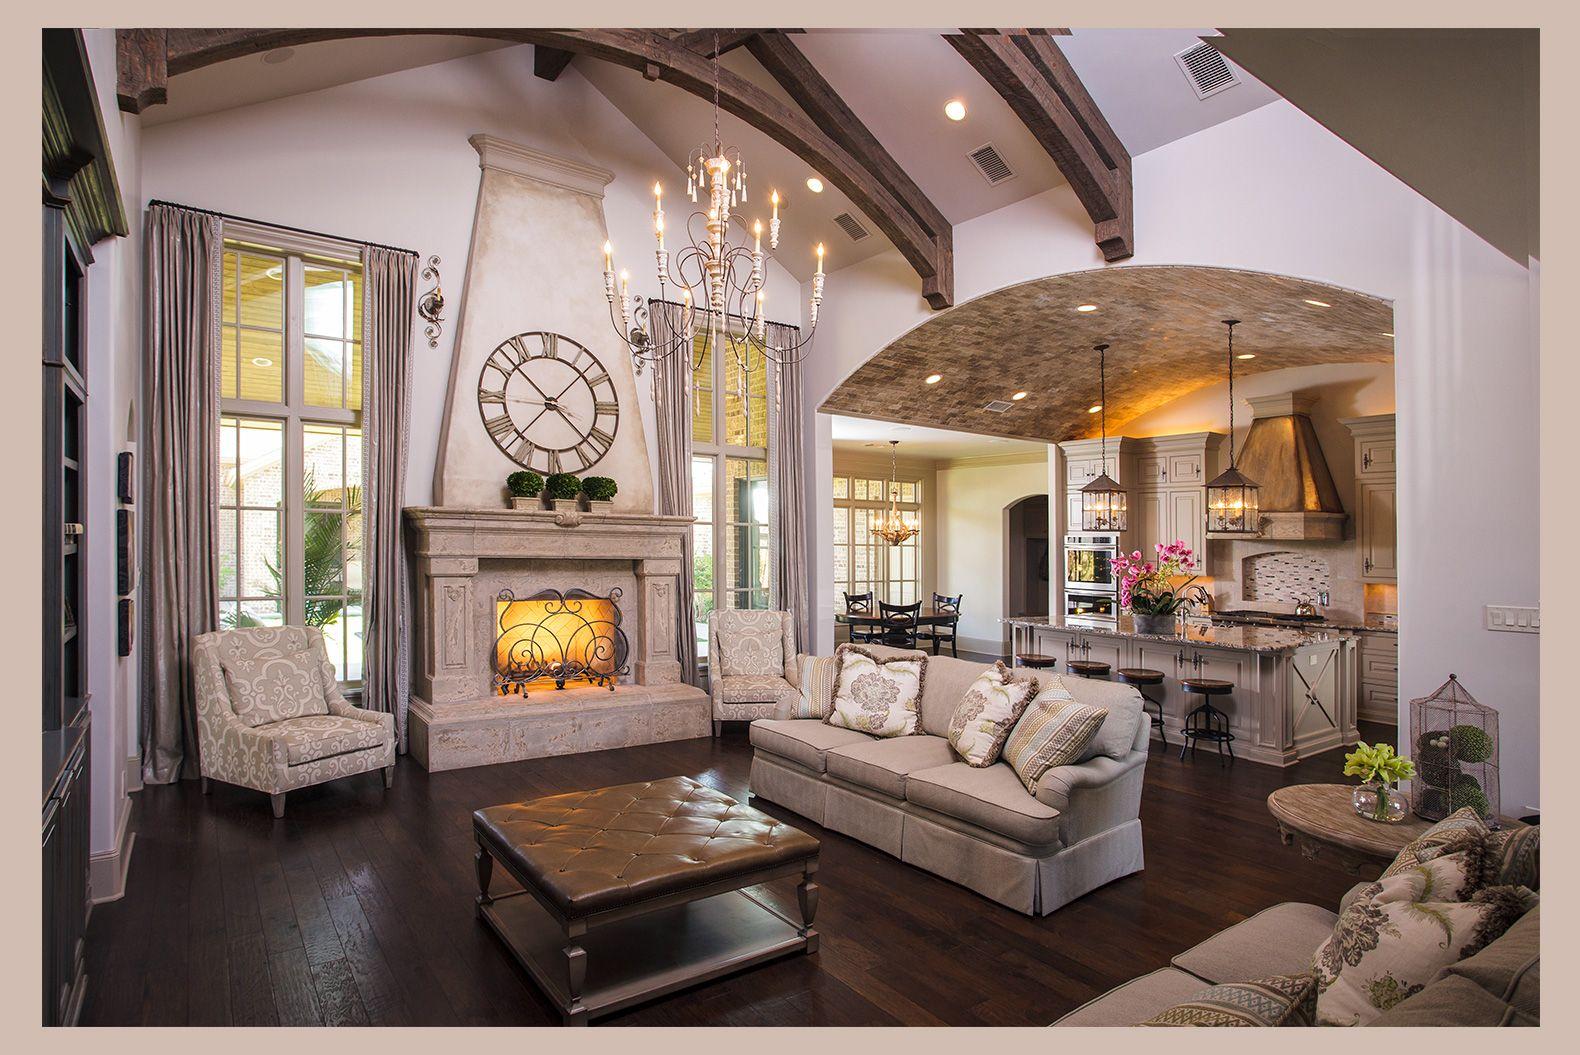 Mike Becknal Construction Lubbock Tx Home Decor Decor House